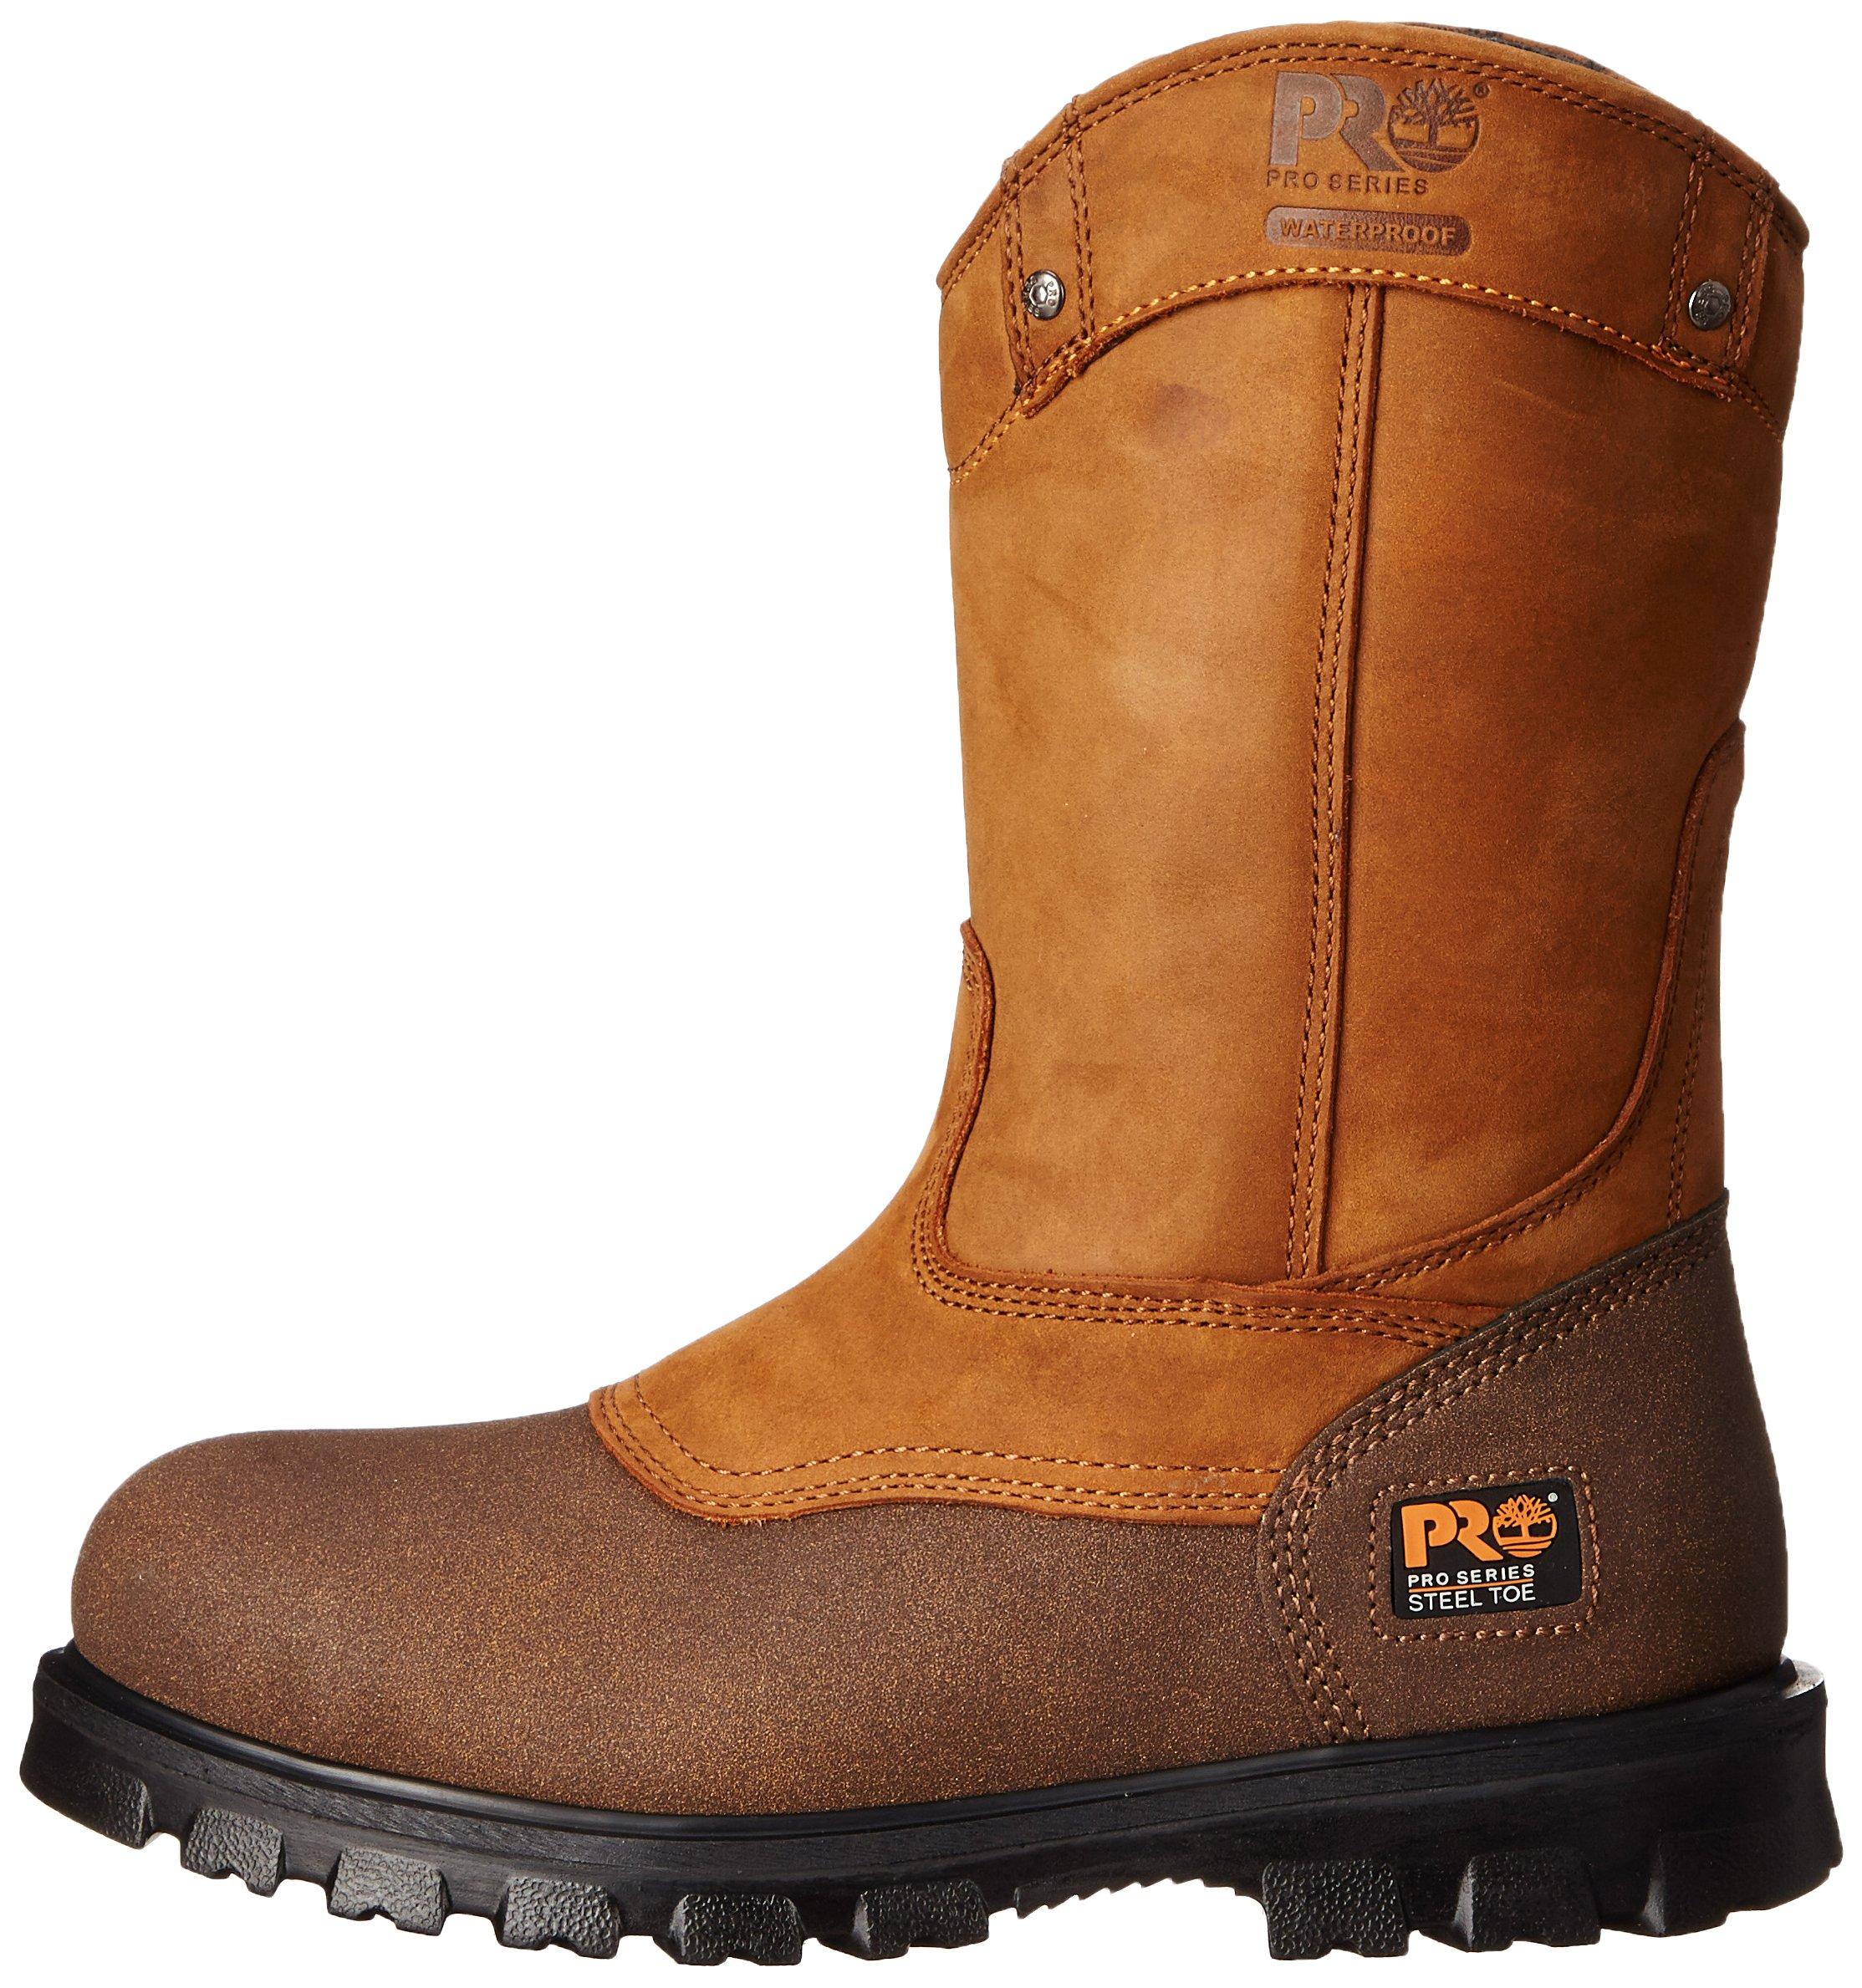 Timberland PRO Men's Rigmaster Wellington Work Shoe,Wheat Bandit,8.5 W US by Timberland PRO (Image #5)